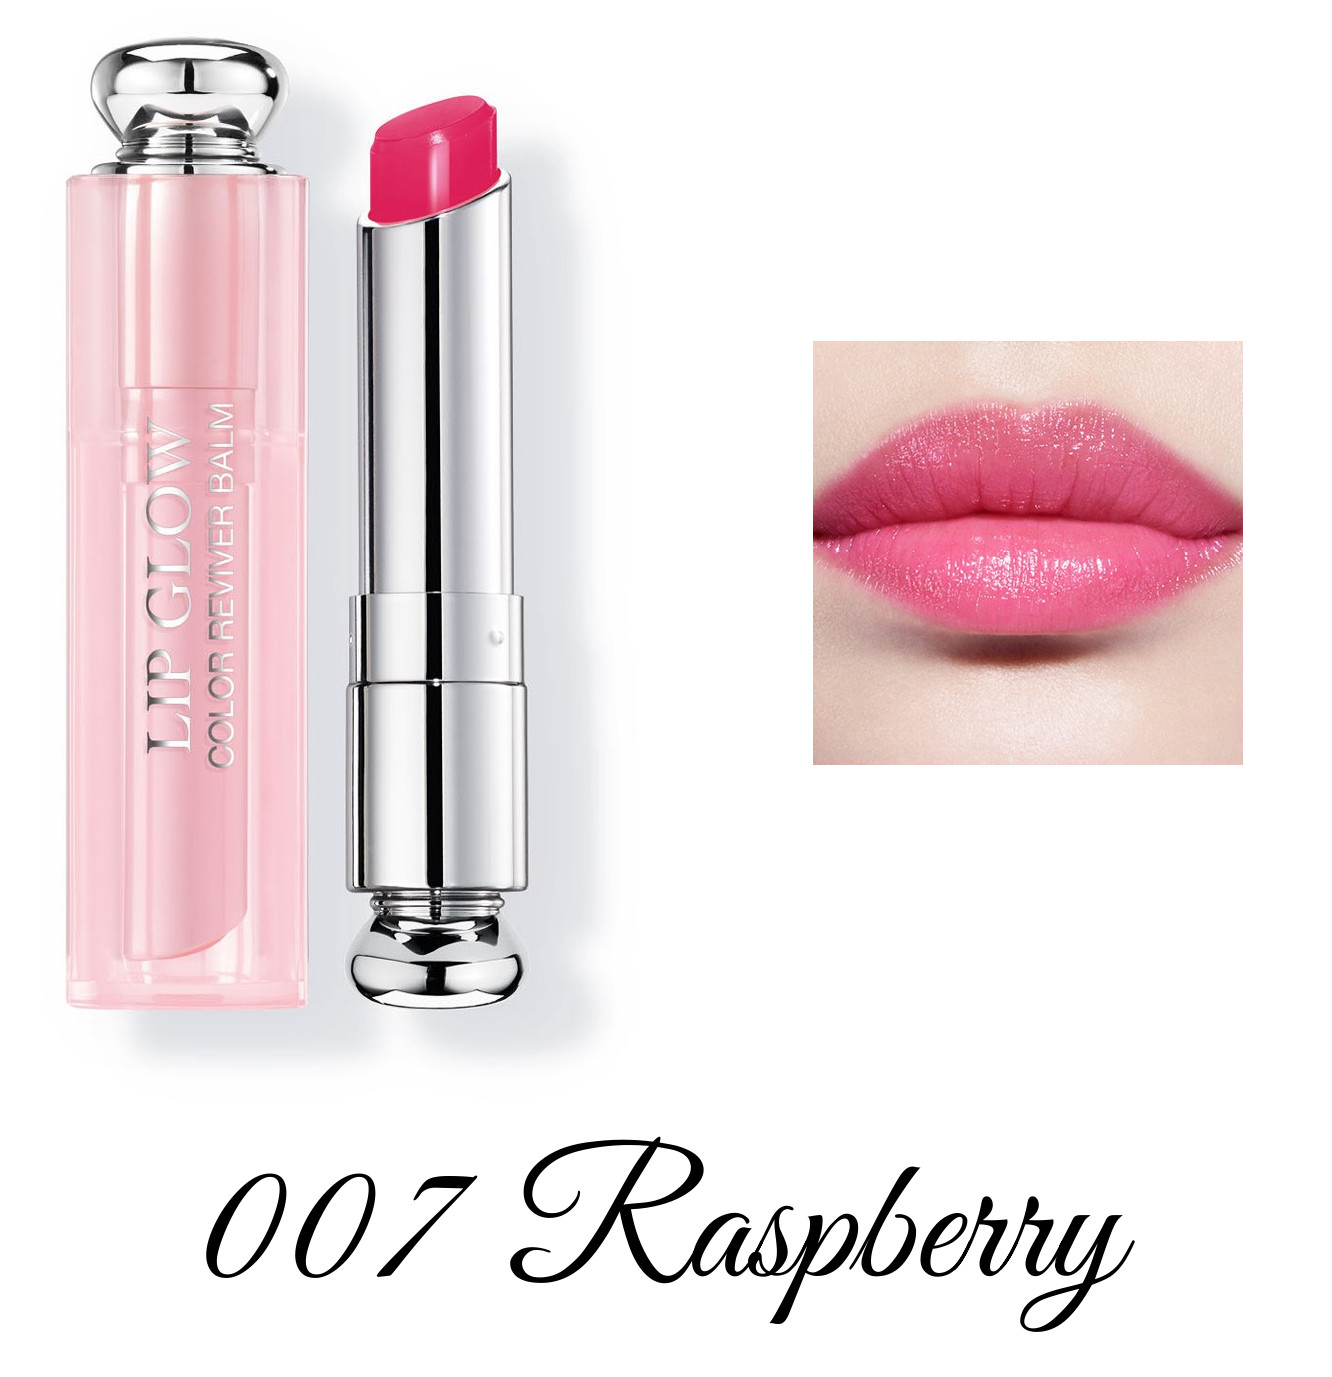 Dior Spring 2018 Collection GLOW ADDICT Dior Addict Lipglow 007 Raspberry